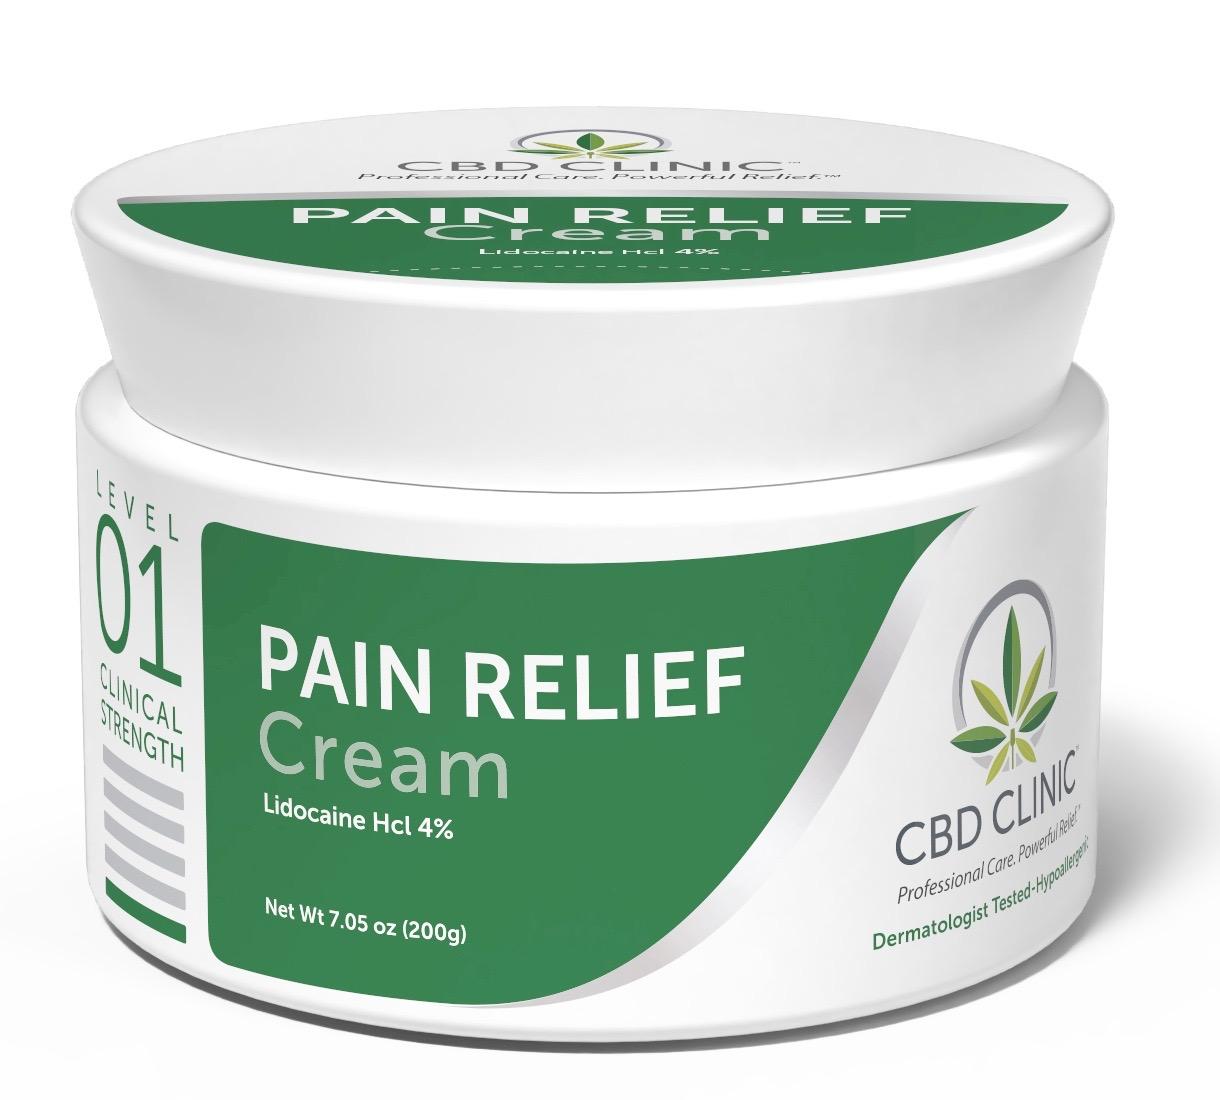 CBD Clinical Strength Pain Relief Cream- Level 1 200g jar